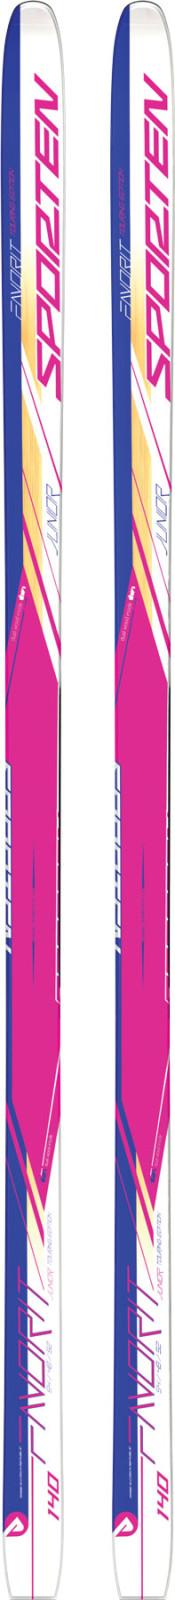 Sporten Favorit Jr. Girl 140 - 170 cm - řezaný protismyk